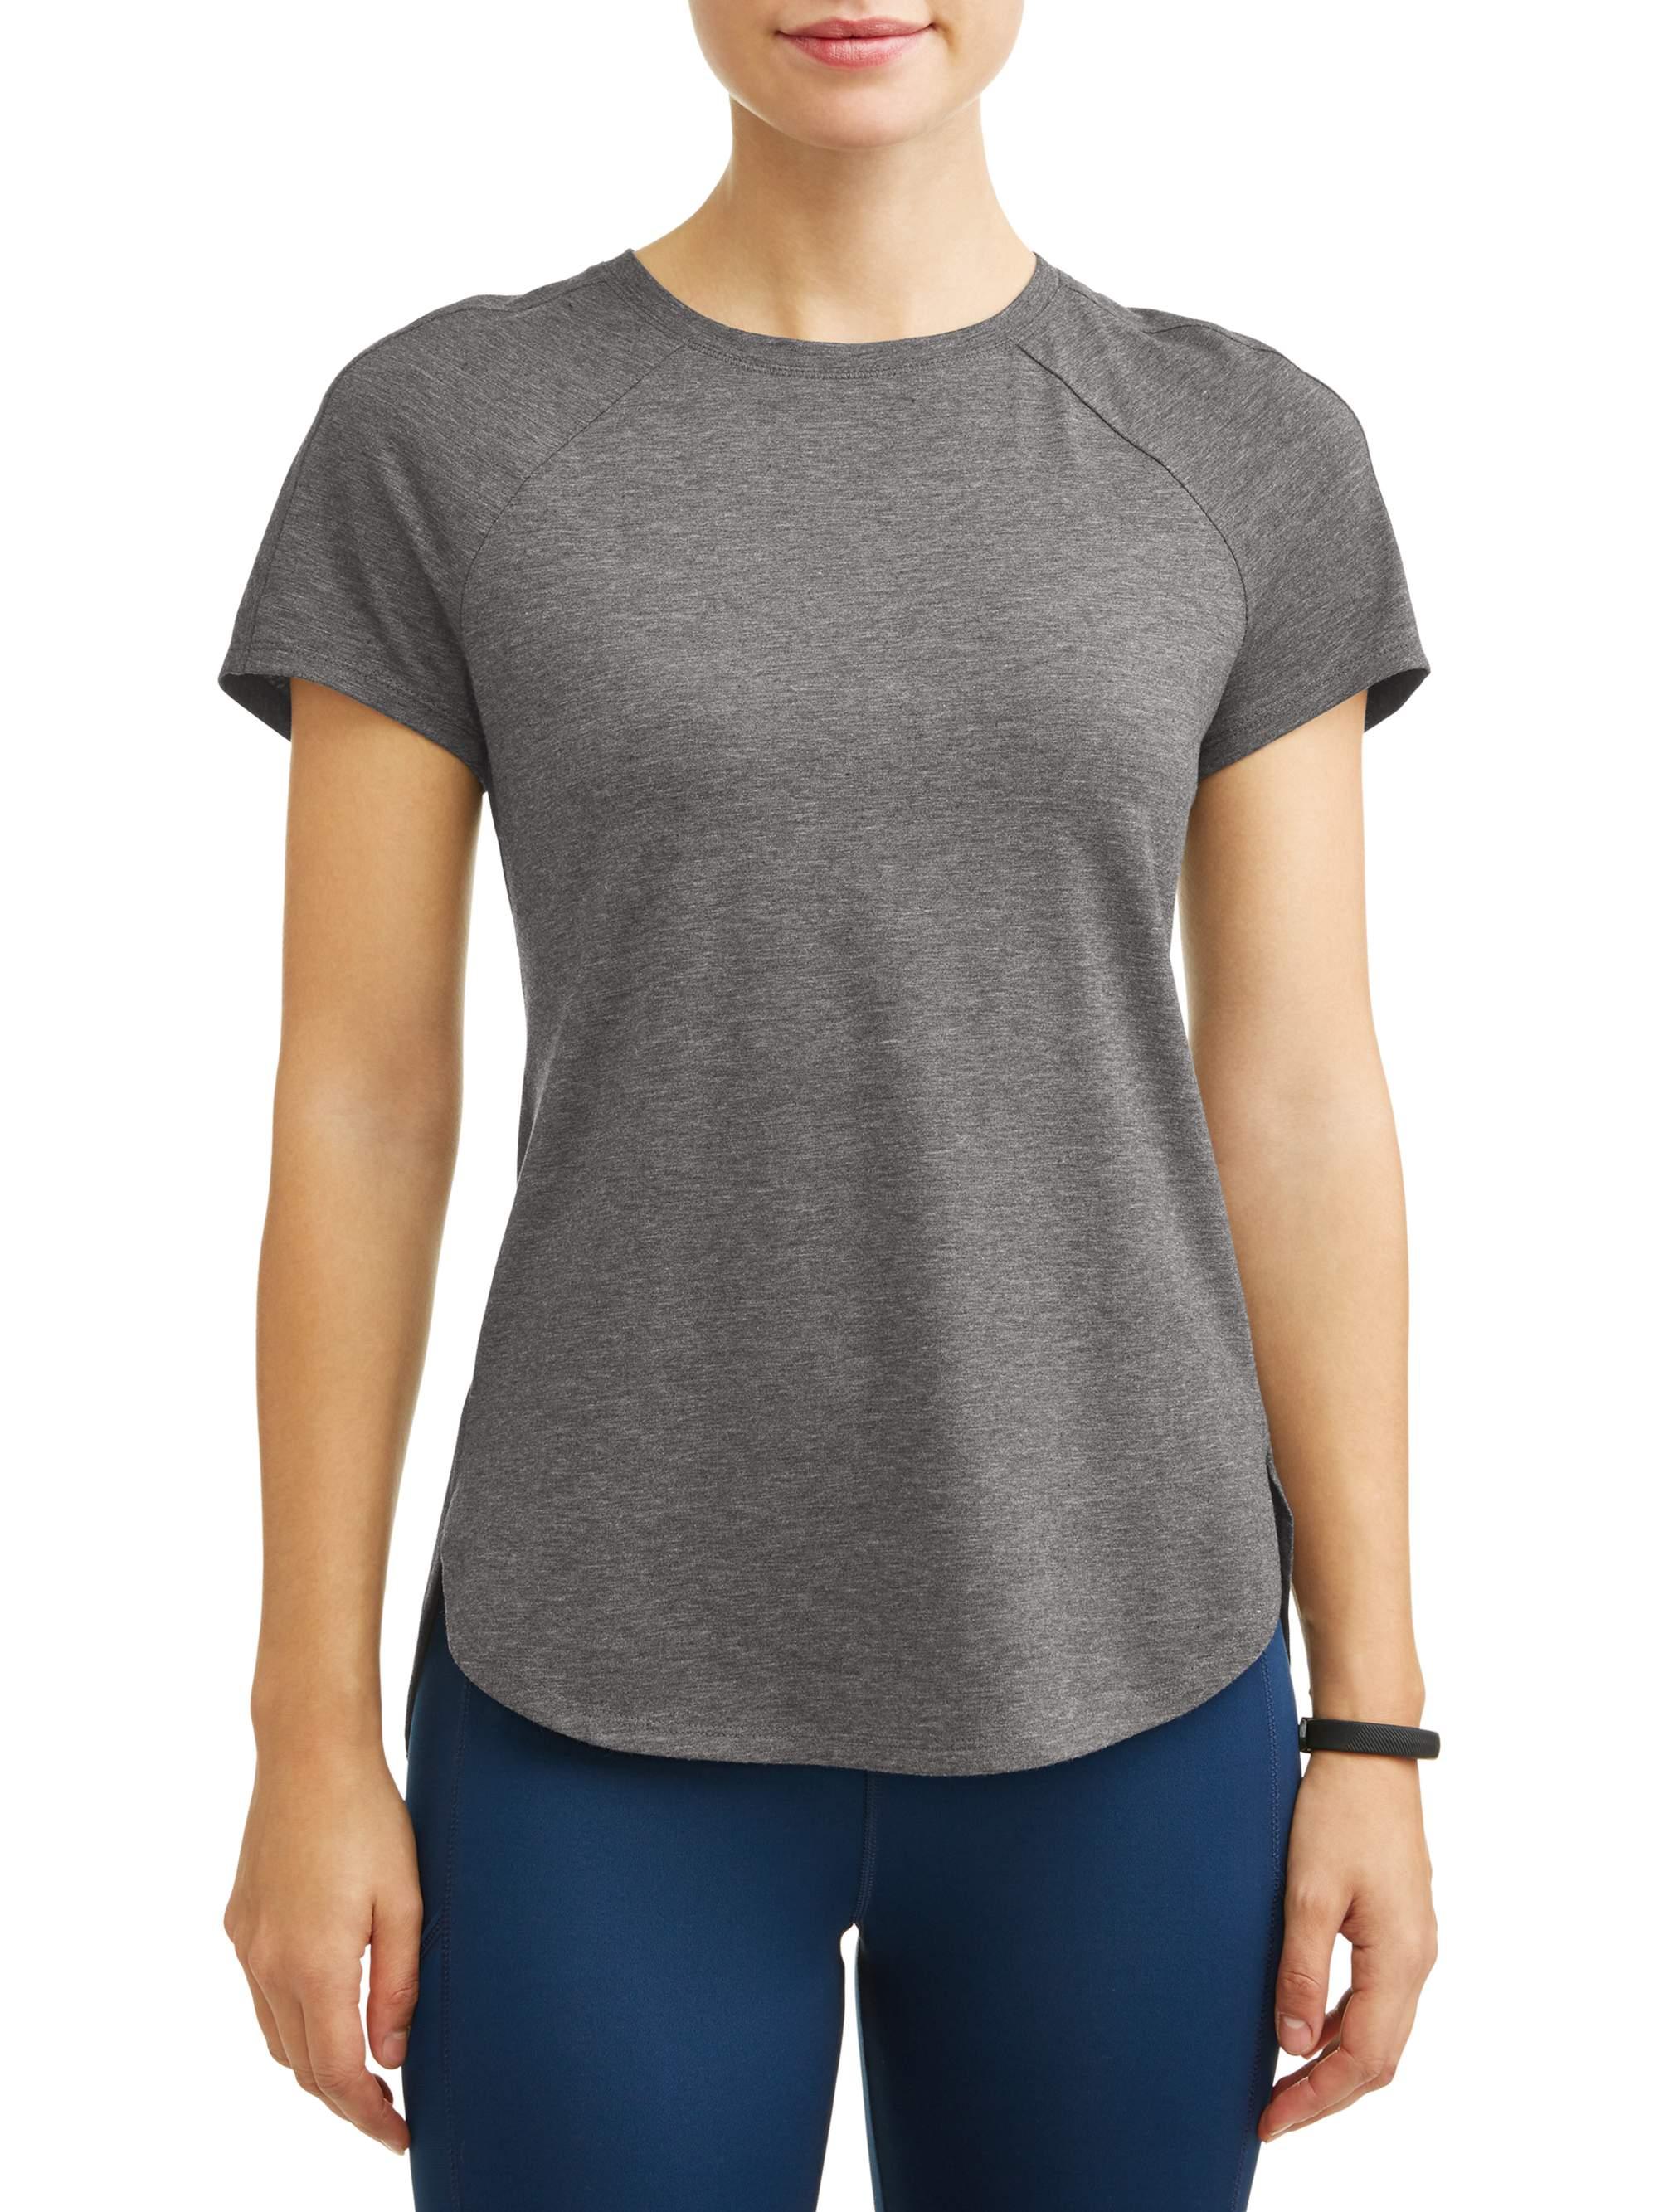 Women's Core Active Short Sleeve Tunic Length Performance T-Shirt